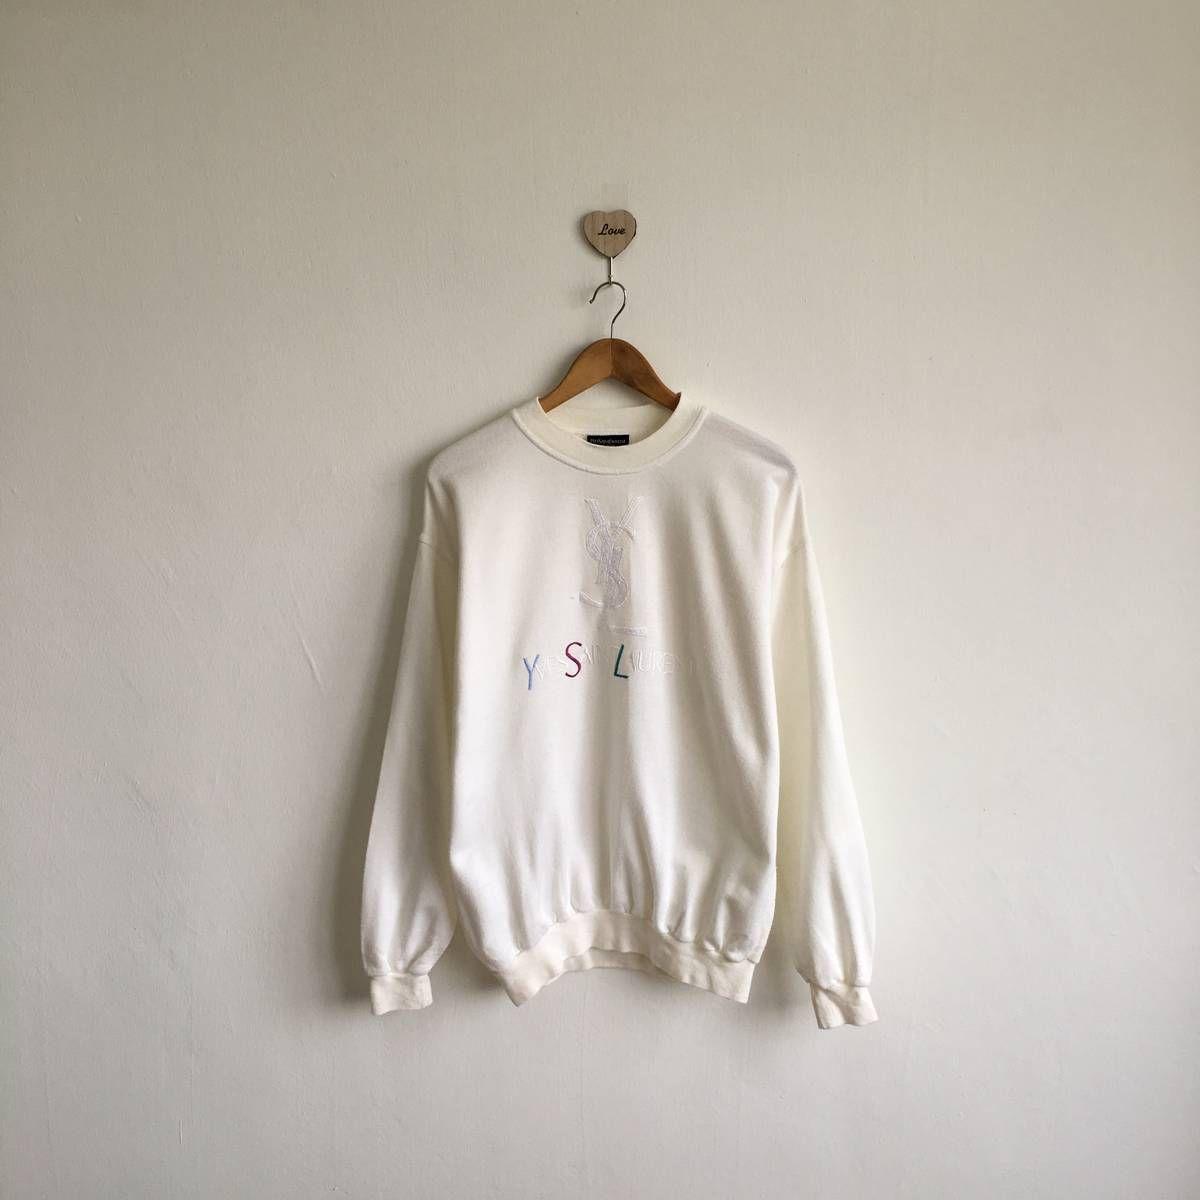 17a746c0 Ysl Pour Homme Rare !! Vintage 80s/90s YVES SAINT LAURENT Pour Homme  Embroidered Logo Rainbow White Sweatshirt Pullover Jumper Size Medium Size  m ...